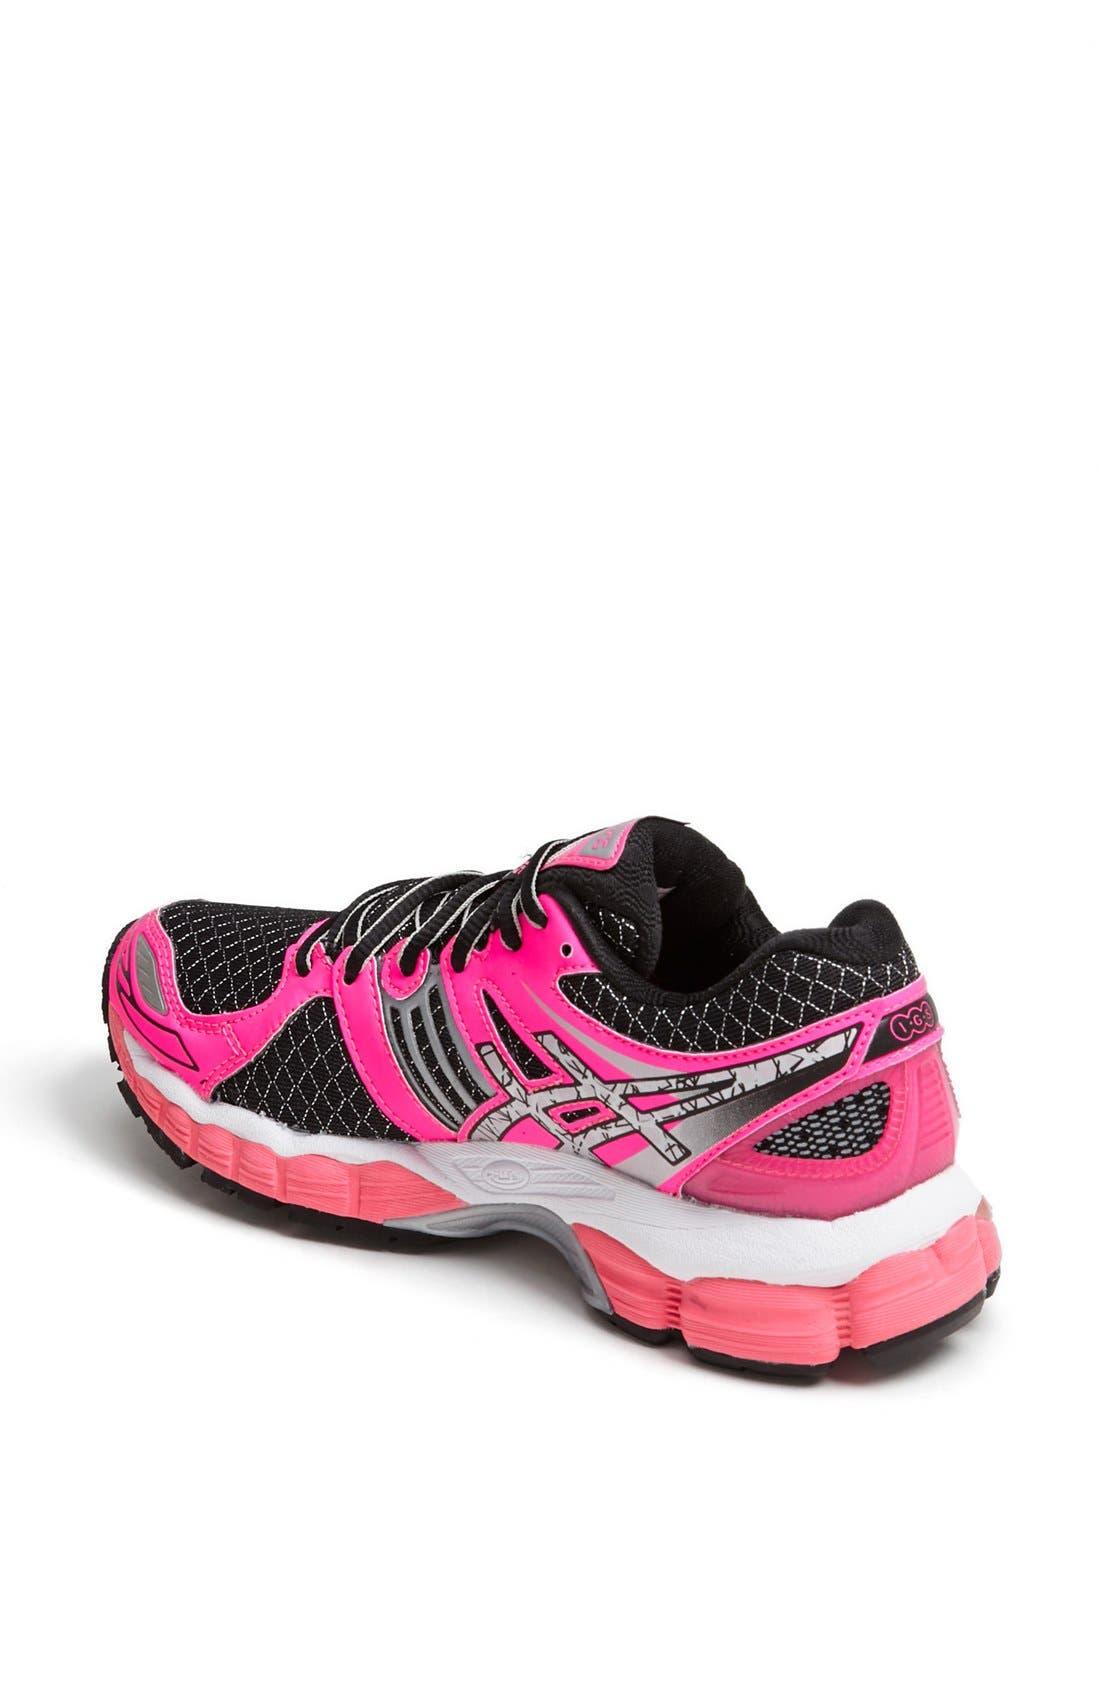 Alternate Image 2  - Asics® 'GEL-Nimbus® 15 Lite' Running Shoe (Women)